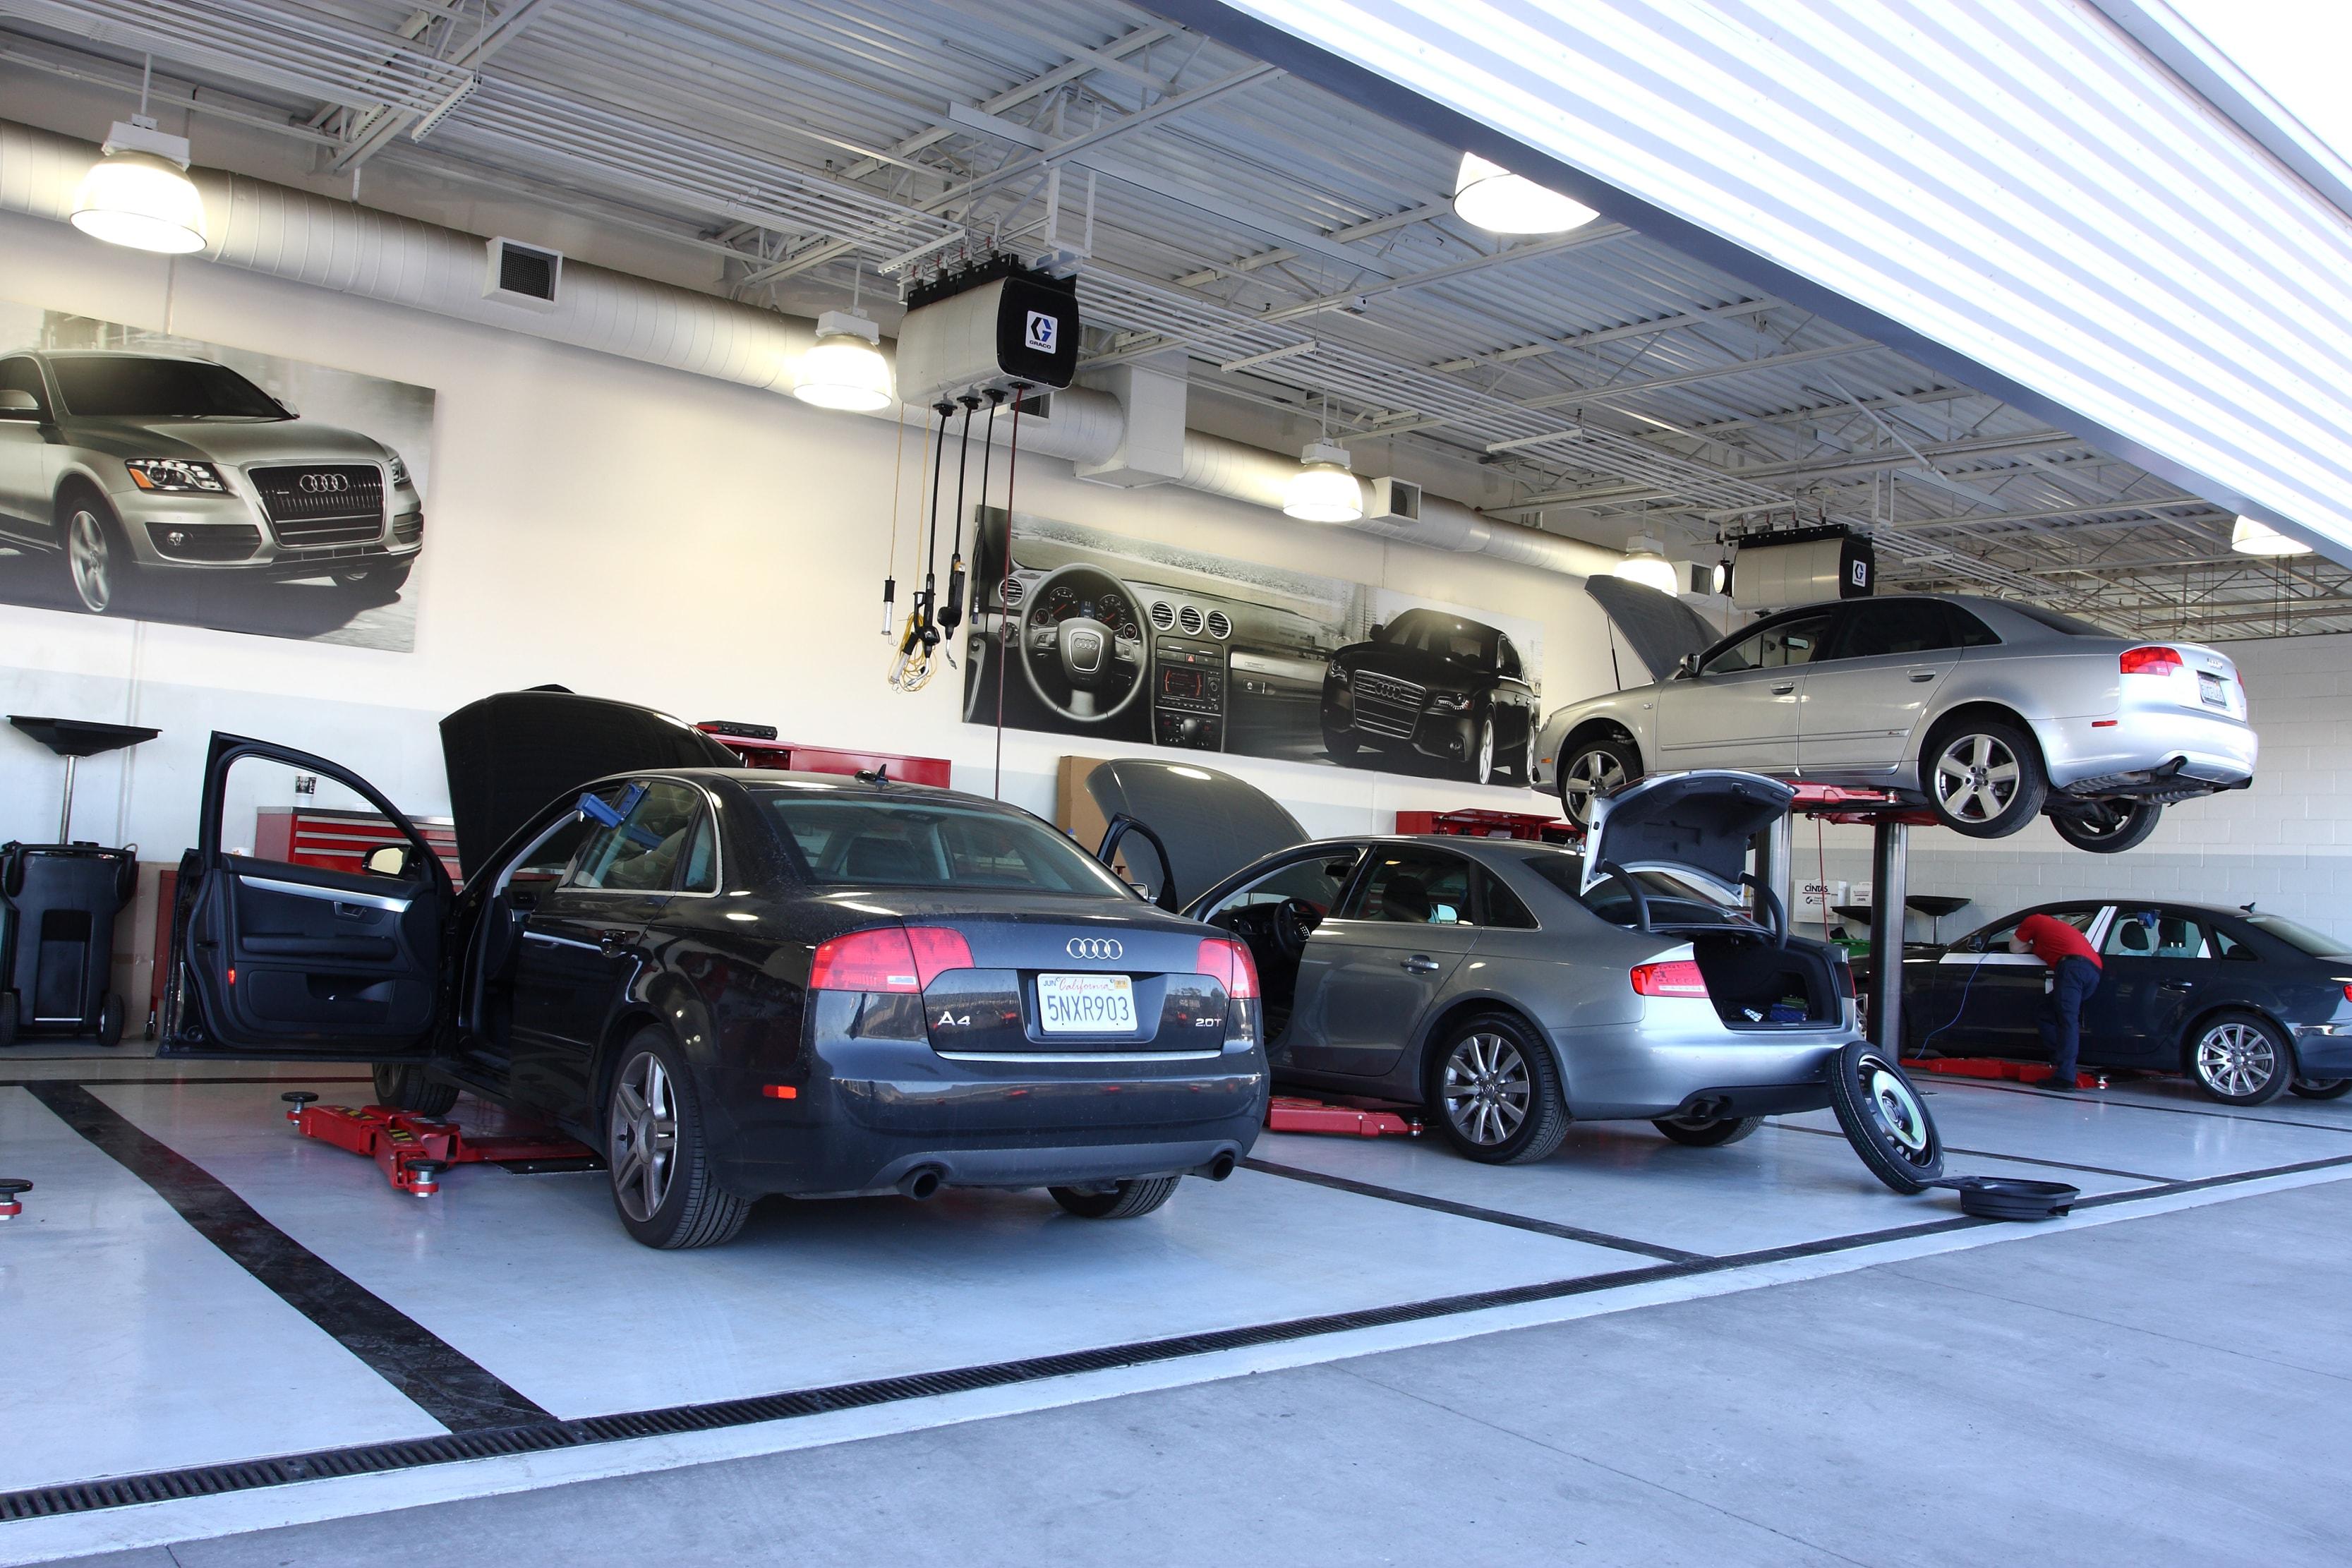 Audi Service Center In Escondido CA - Audi car repair